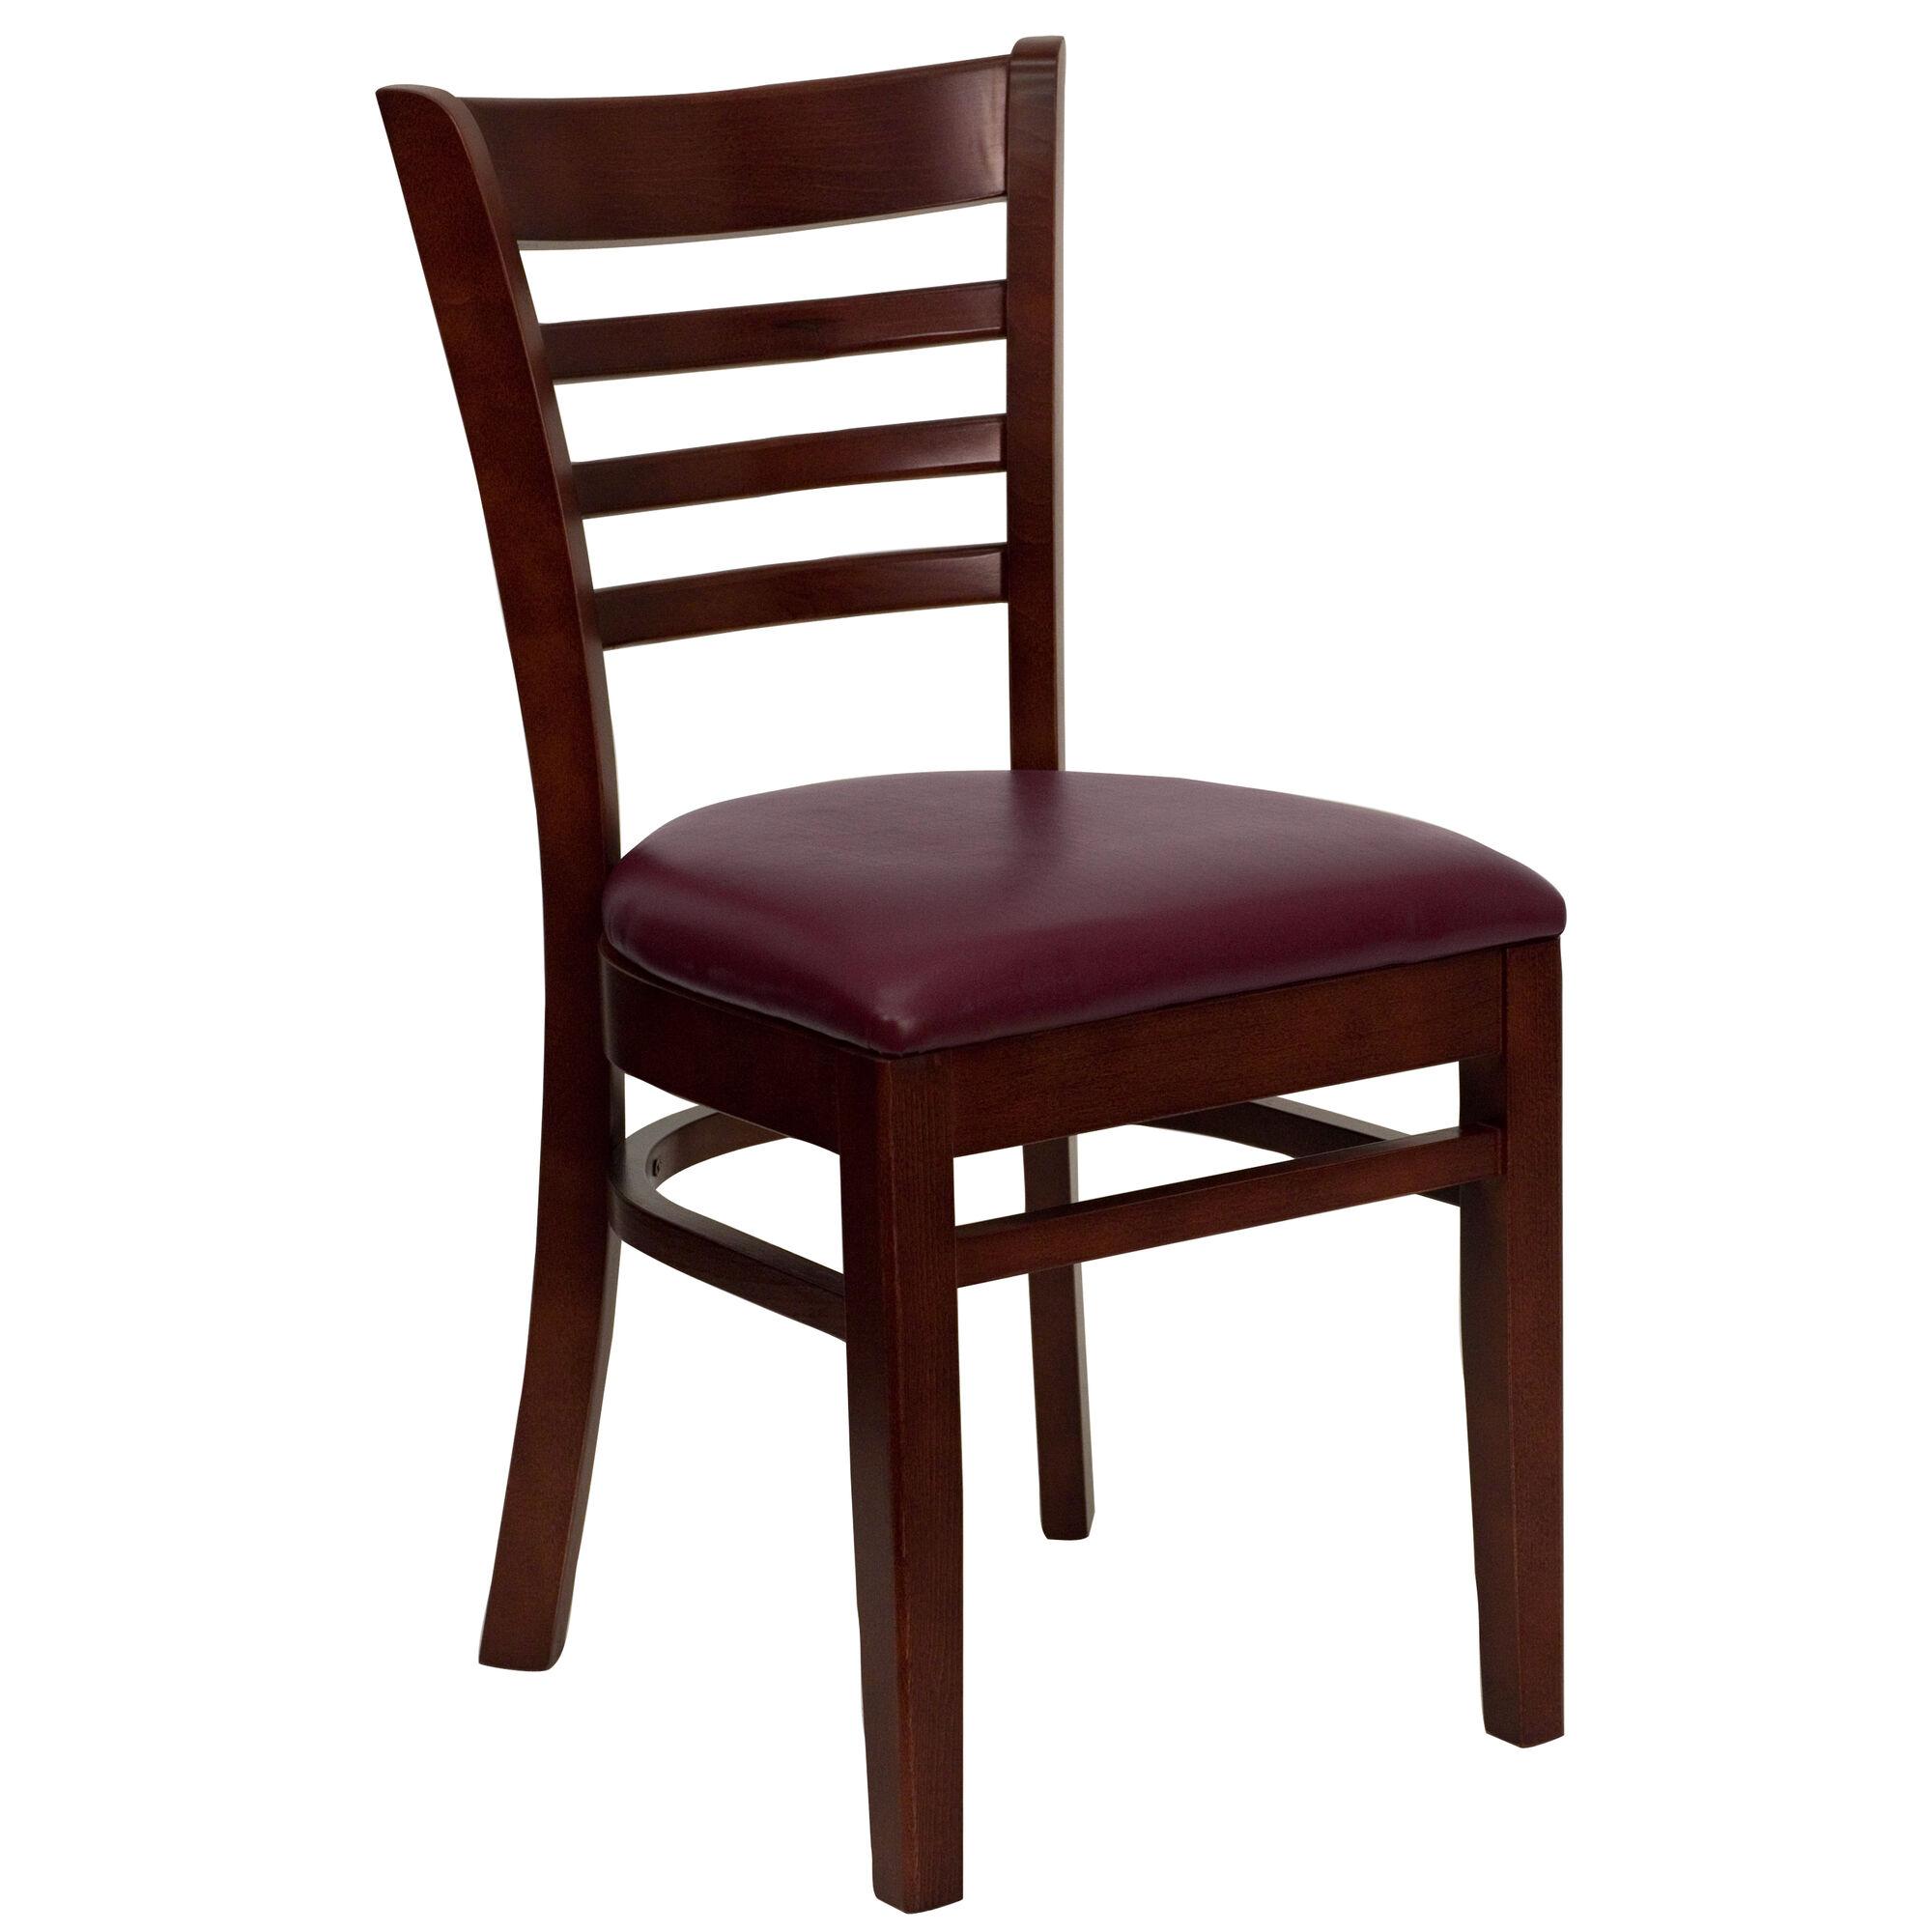 restaurantfurniture4less wood chairs